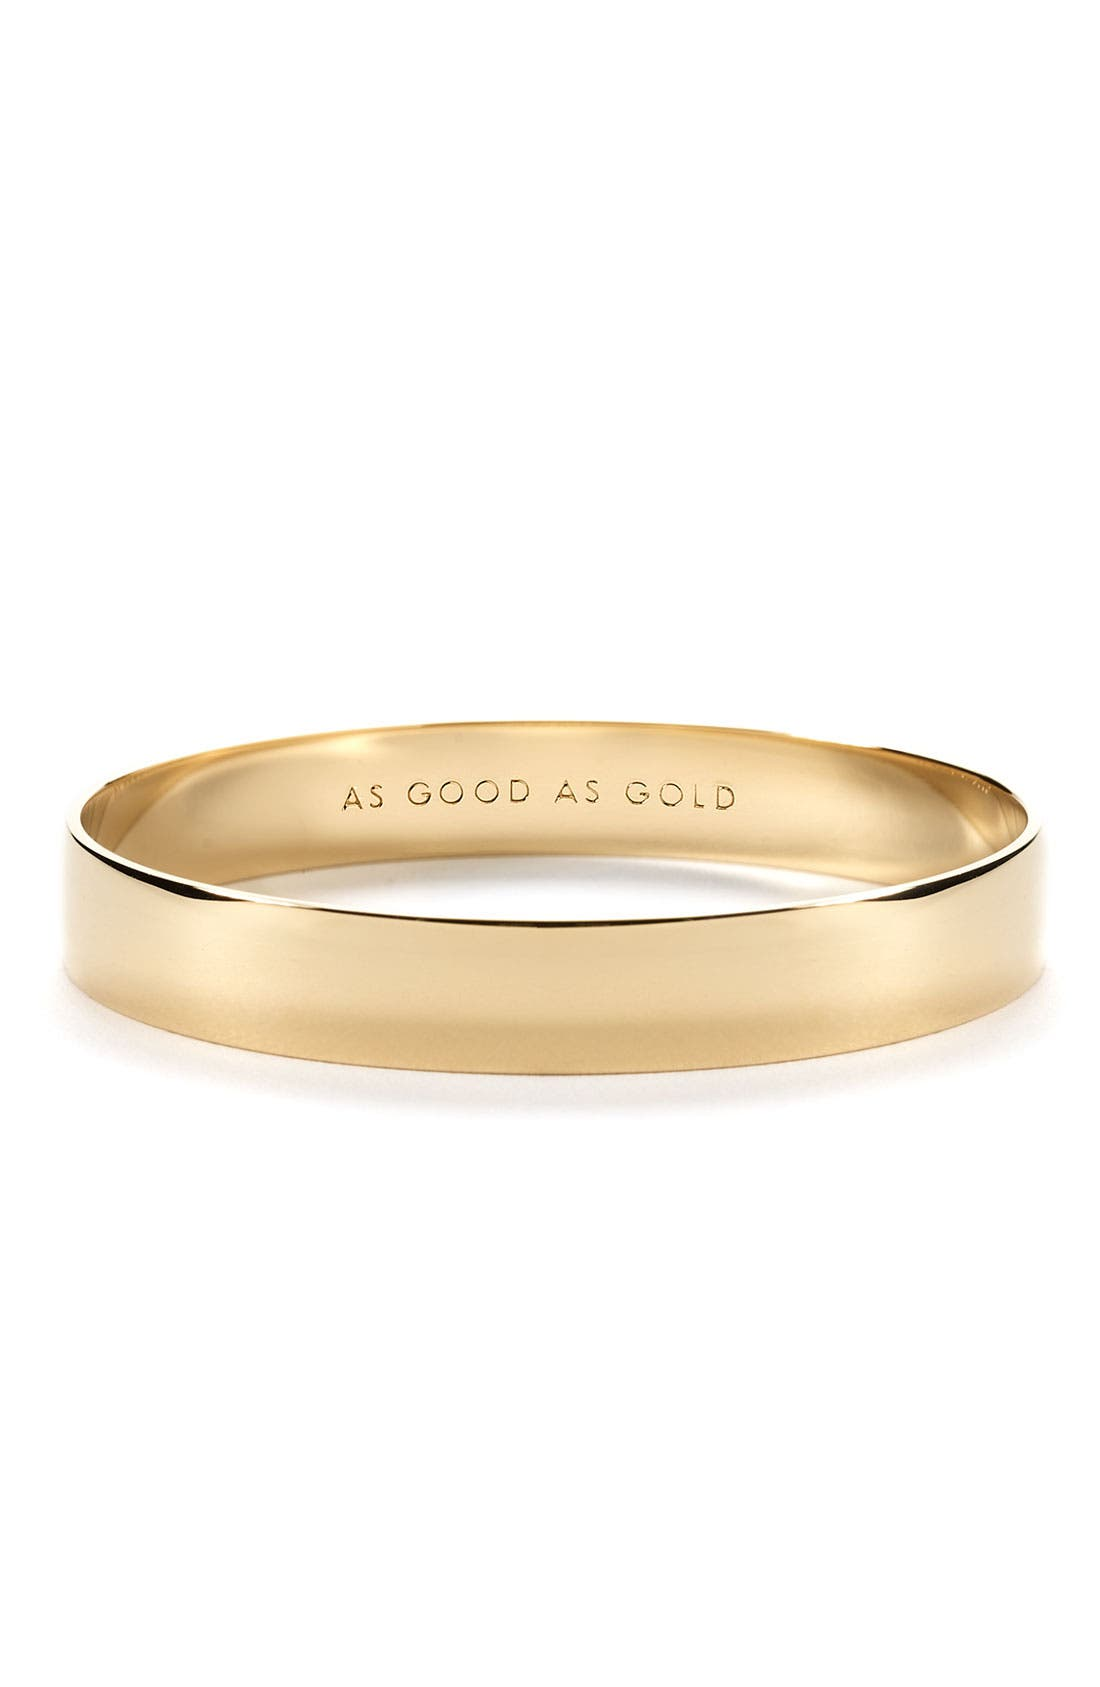 Kate Spade  'IDIOM - GOOD AS GOLD' BANGLE